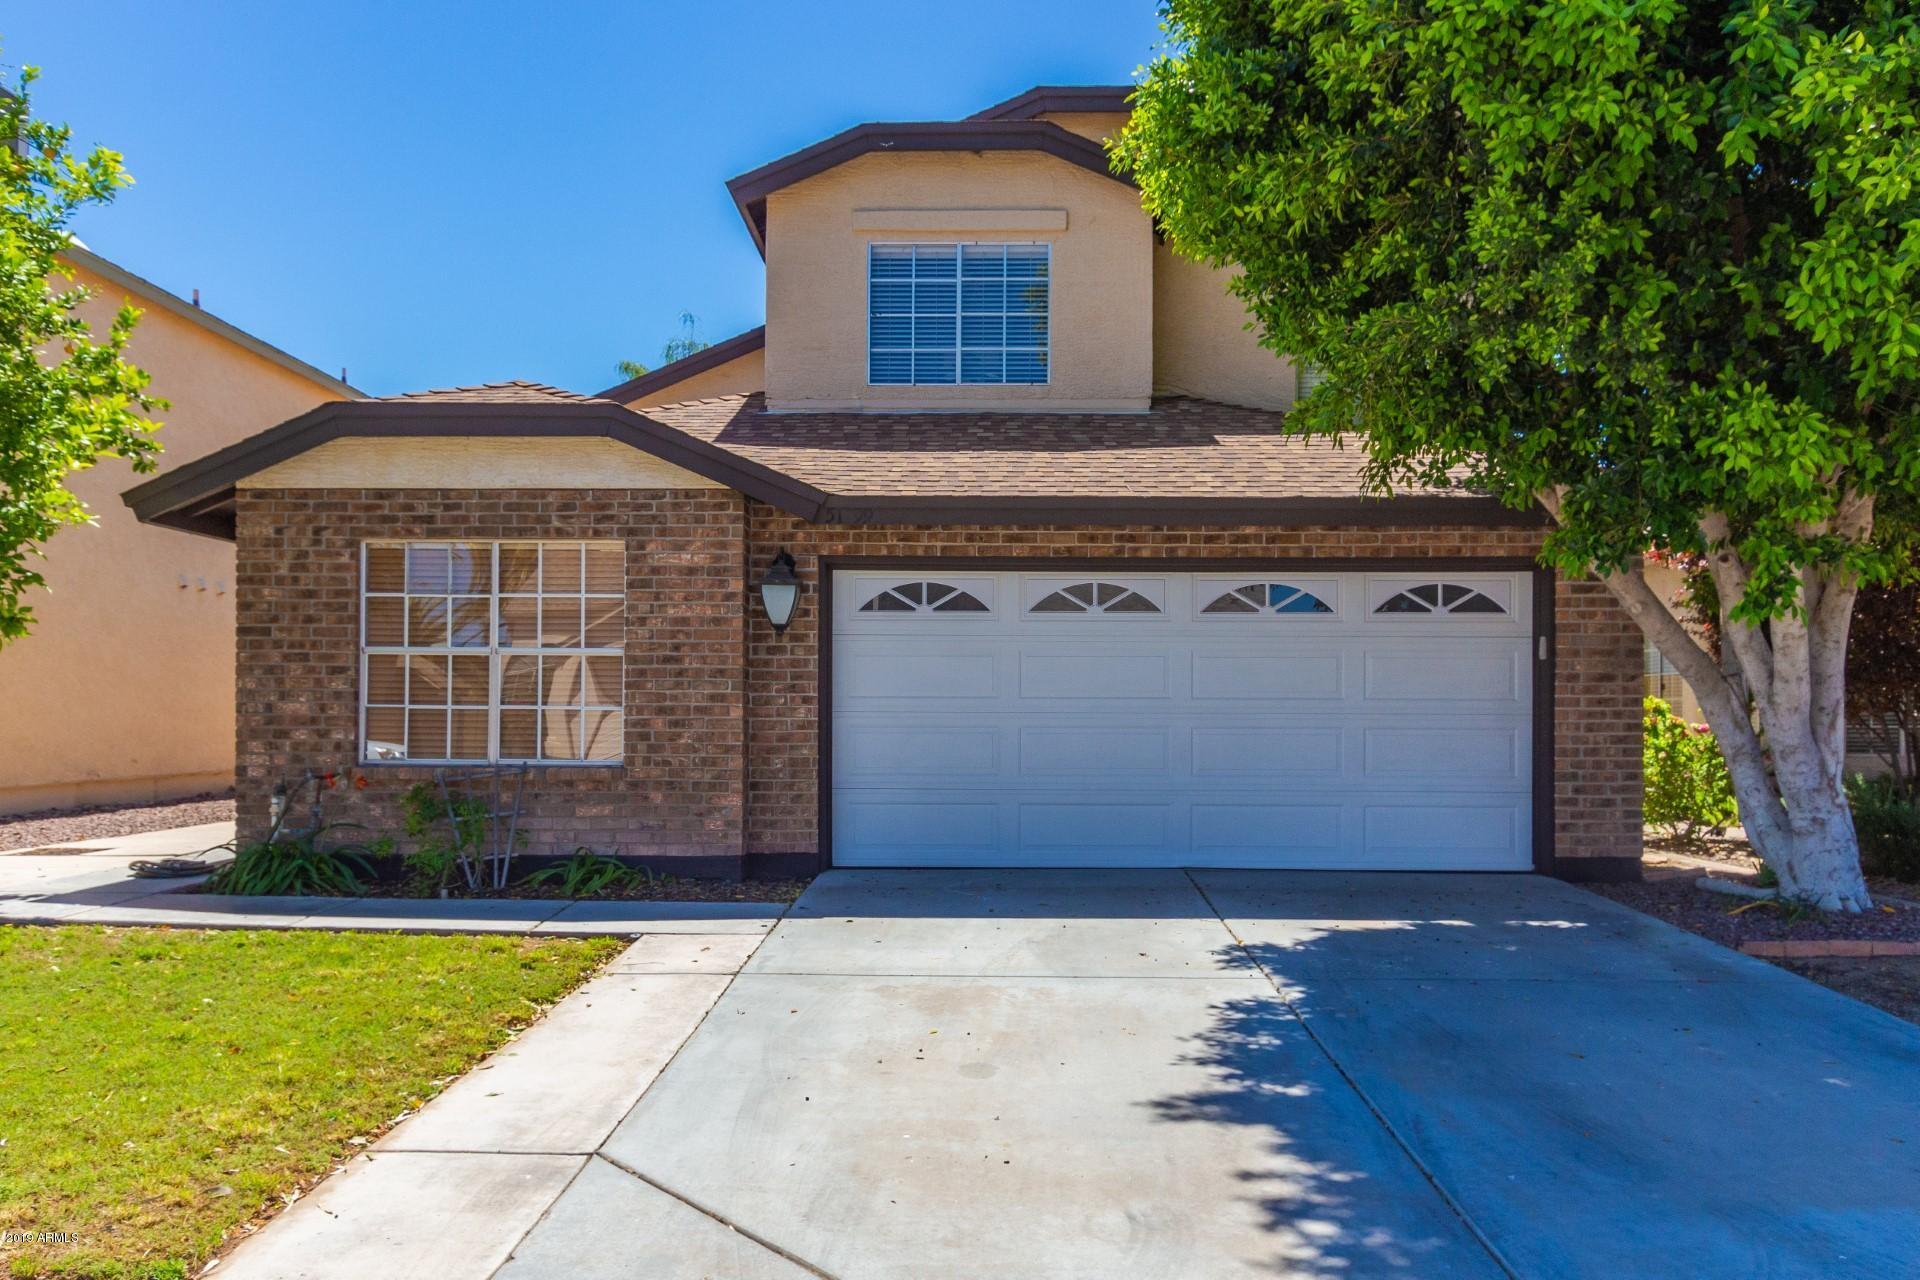 Photo of 5199 W Saragosa Street, Chandler, AZ 85226